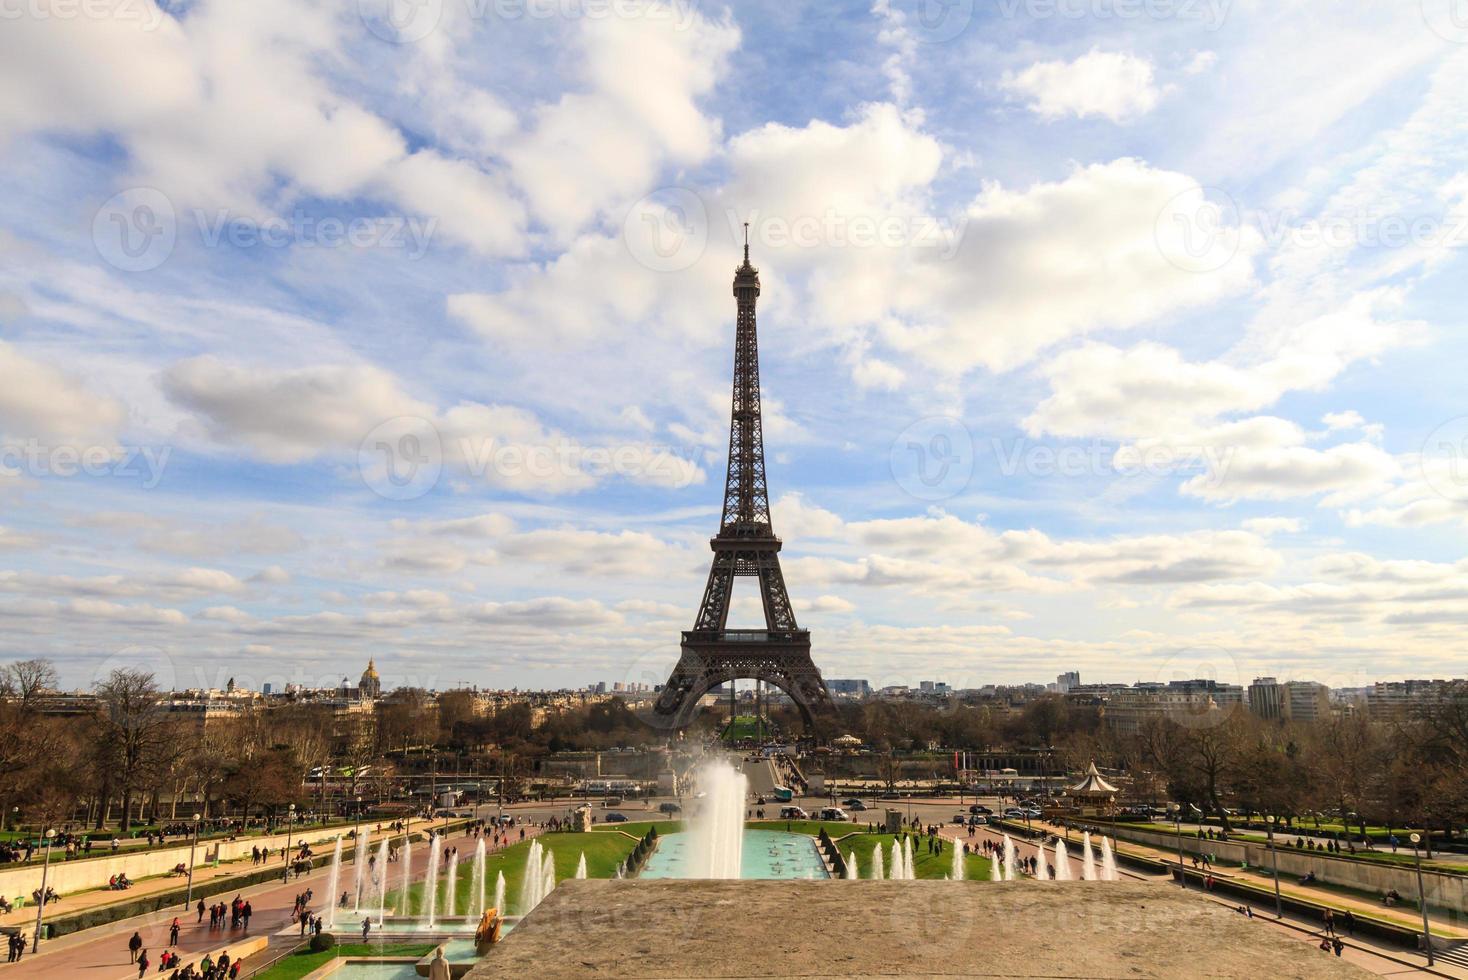 torre eiffel em paris foto